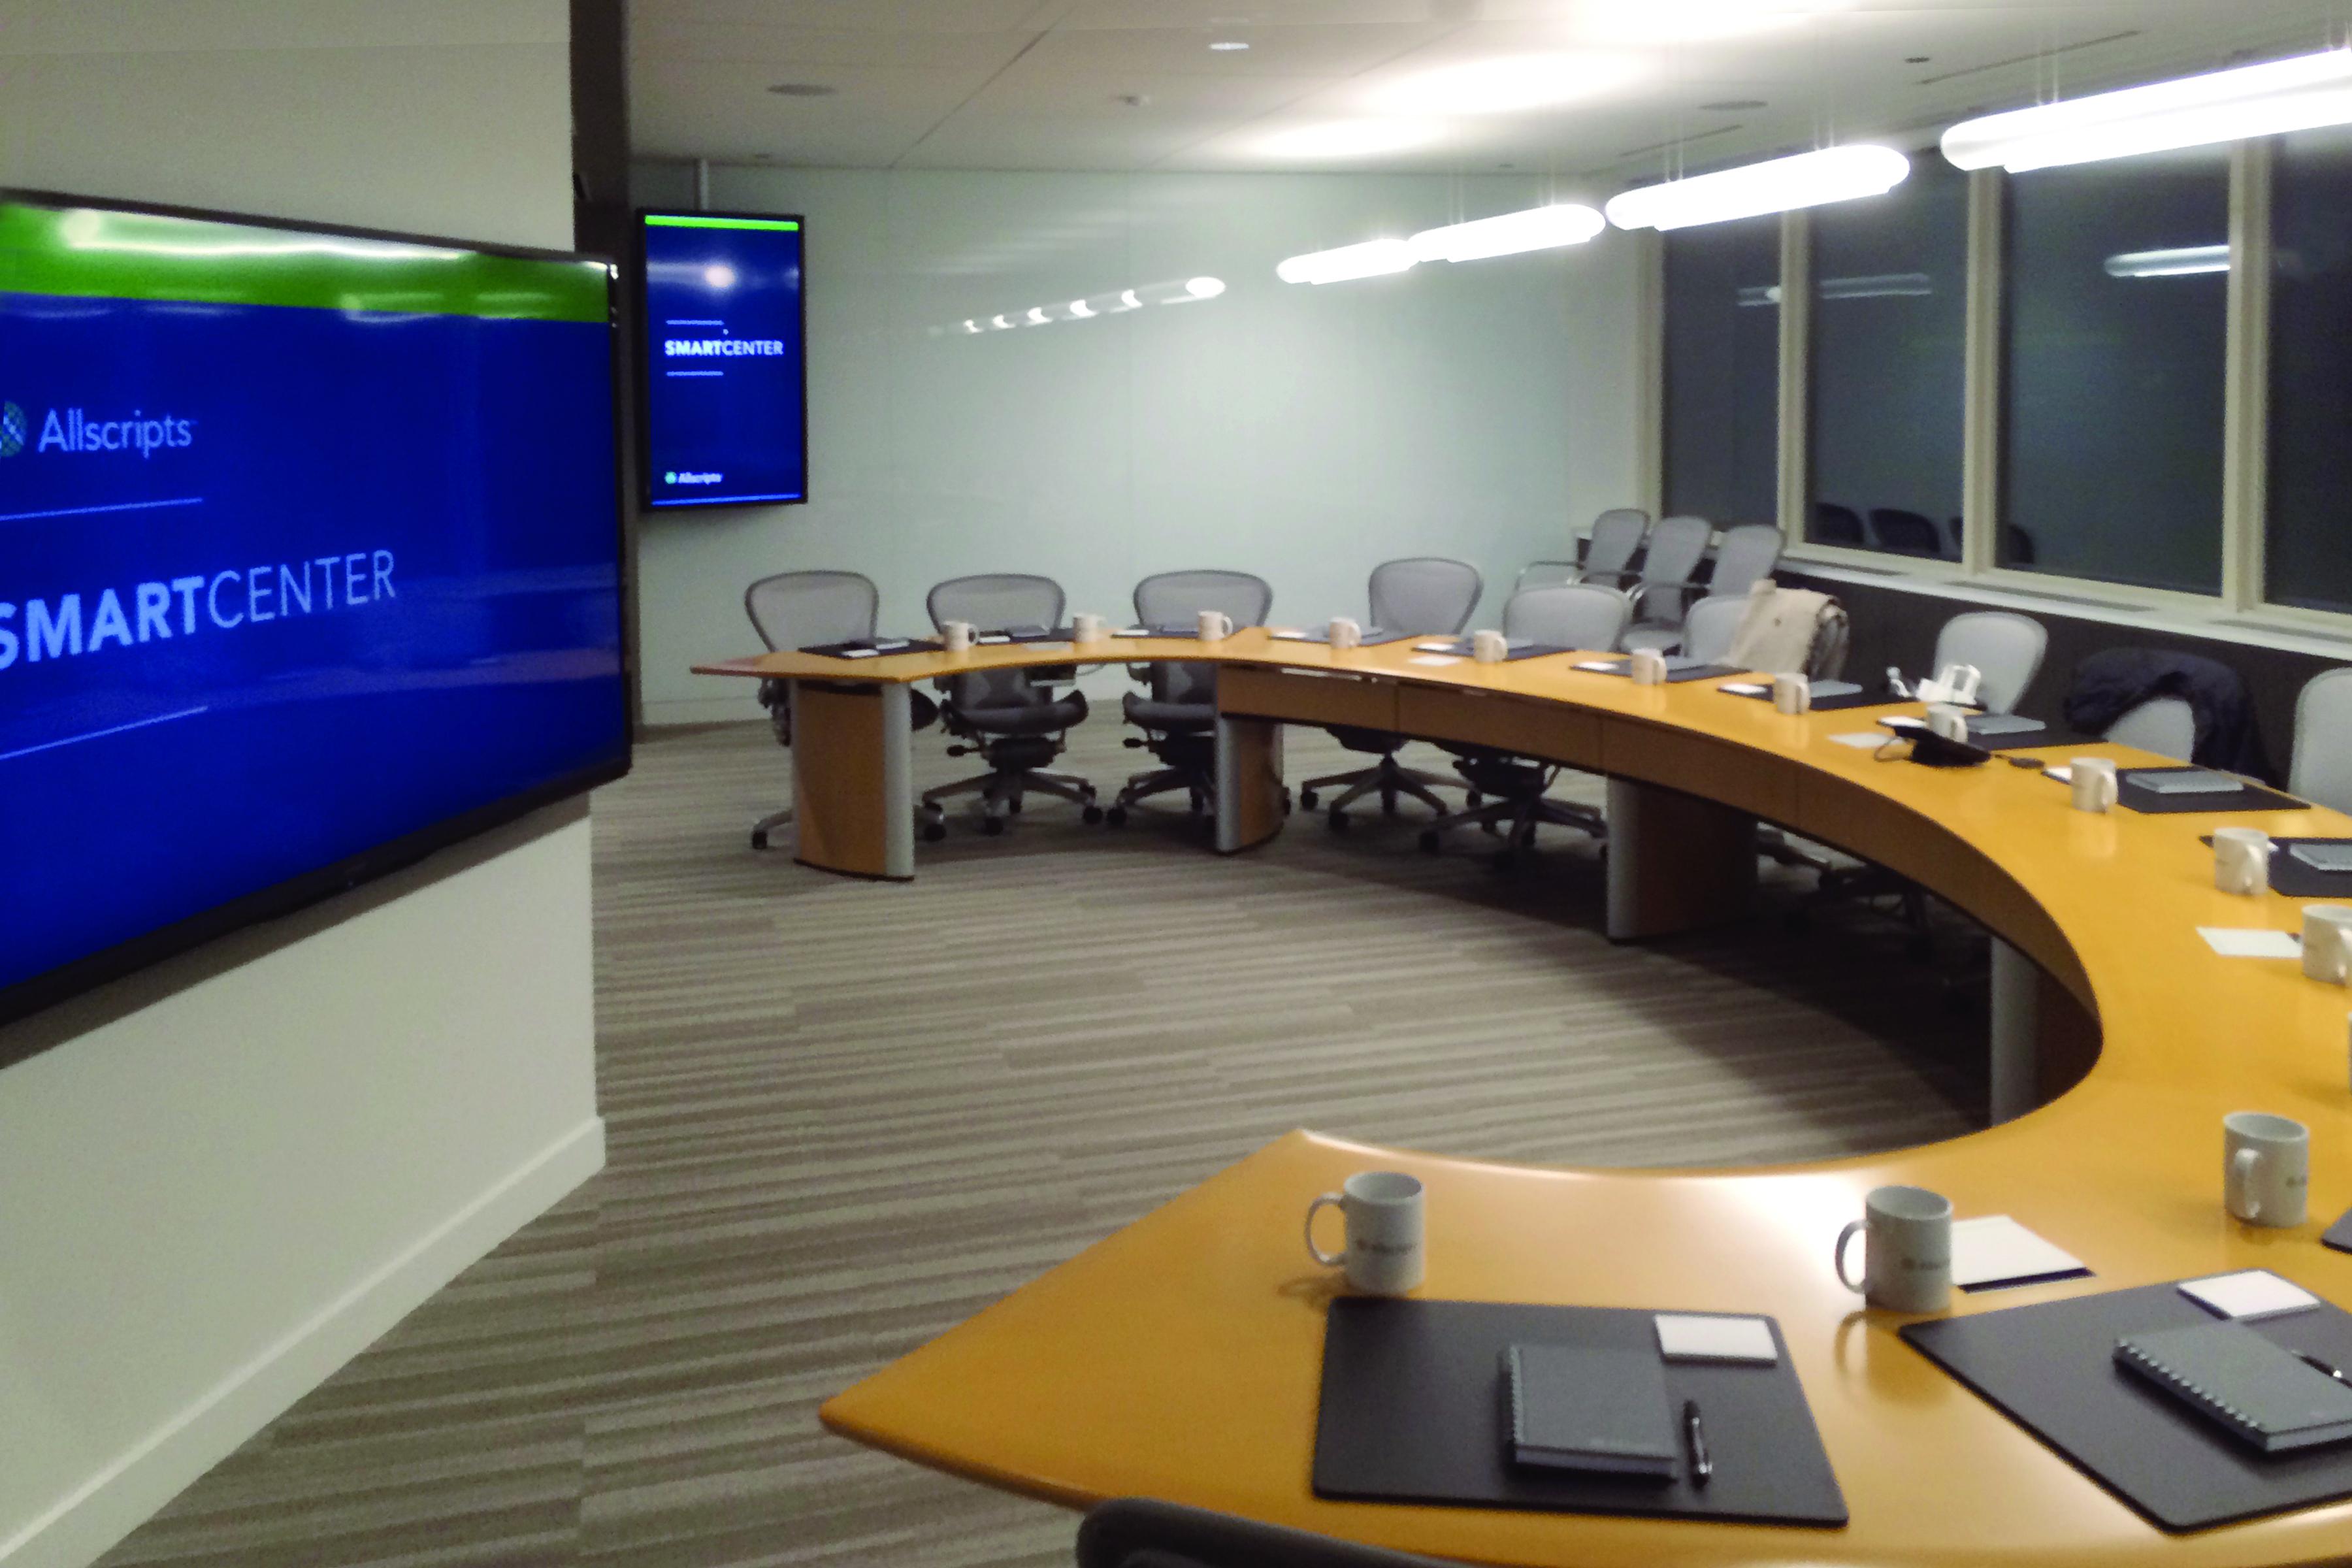 Visitor Center Smart Center